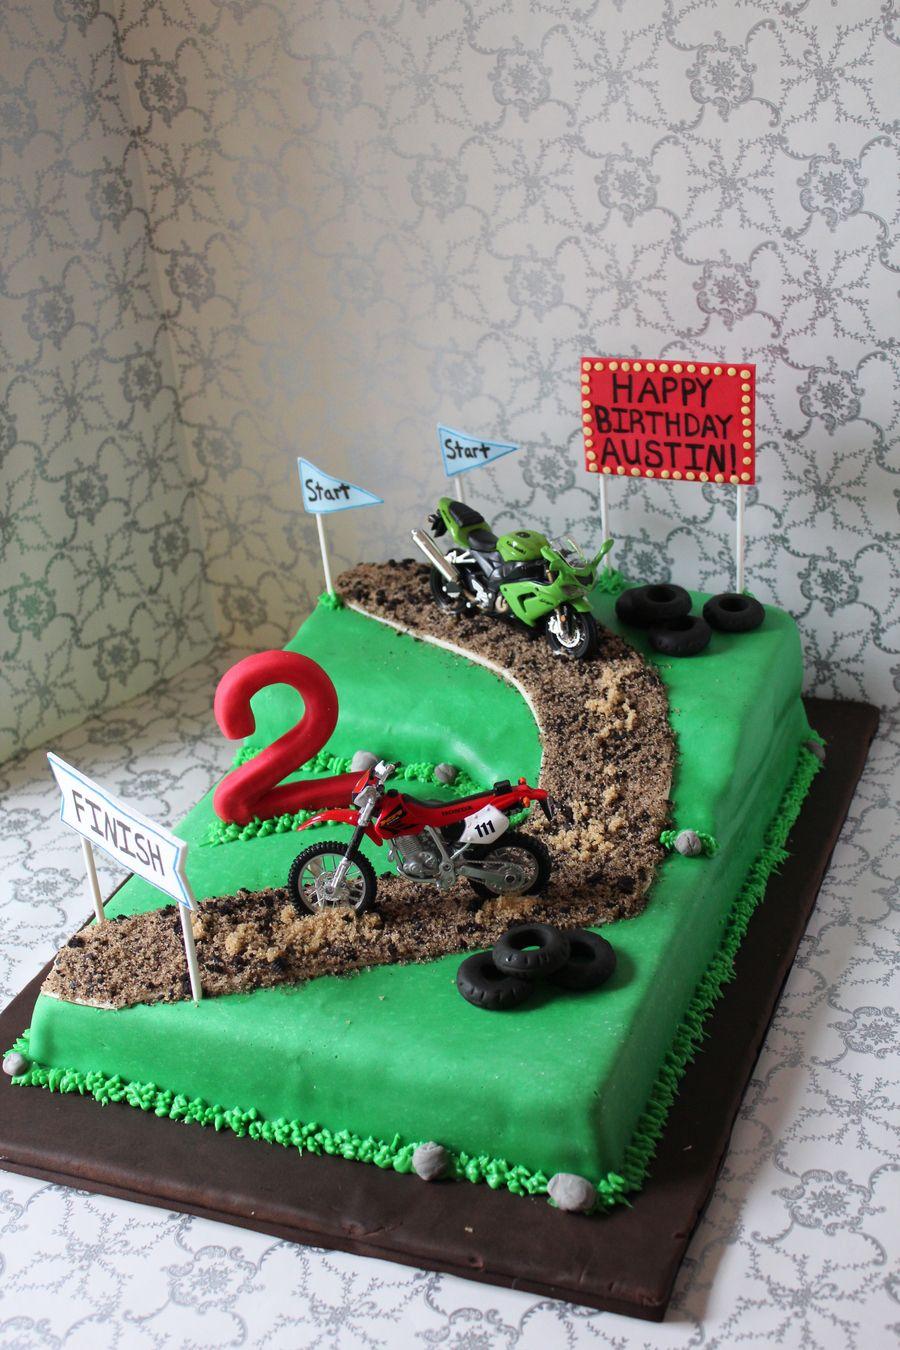 Bike Track Cake cakes Pinterest Cake Birthday cakes and Food